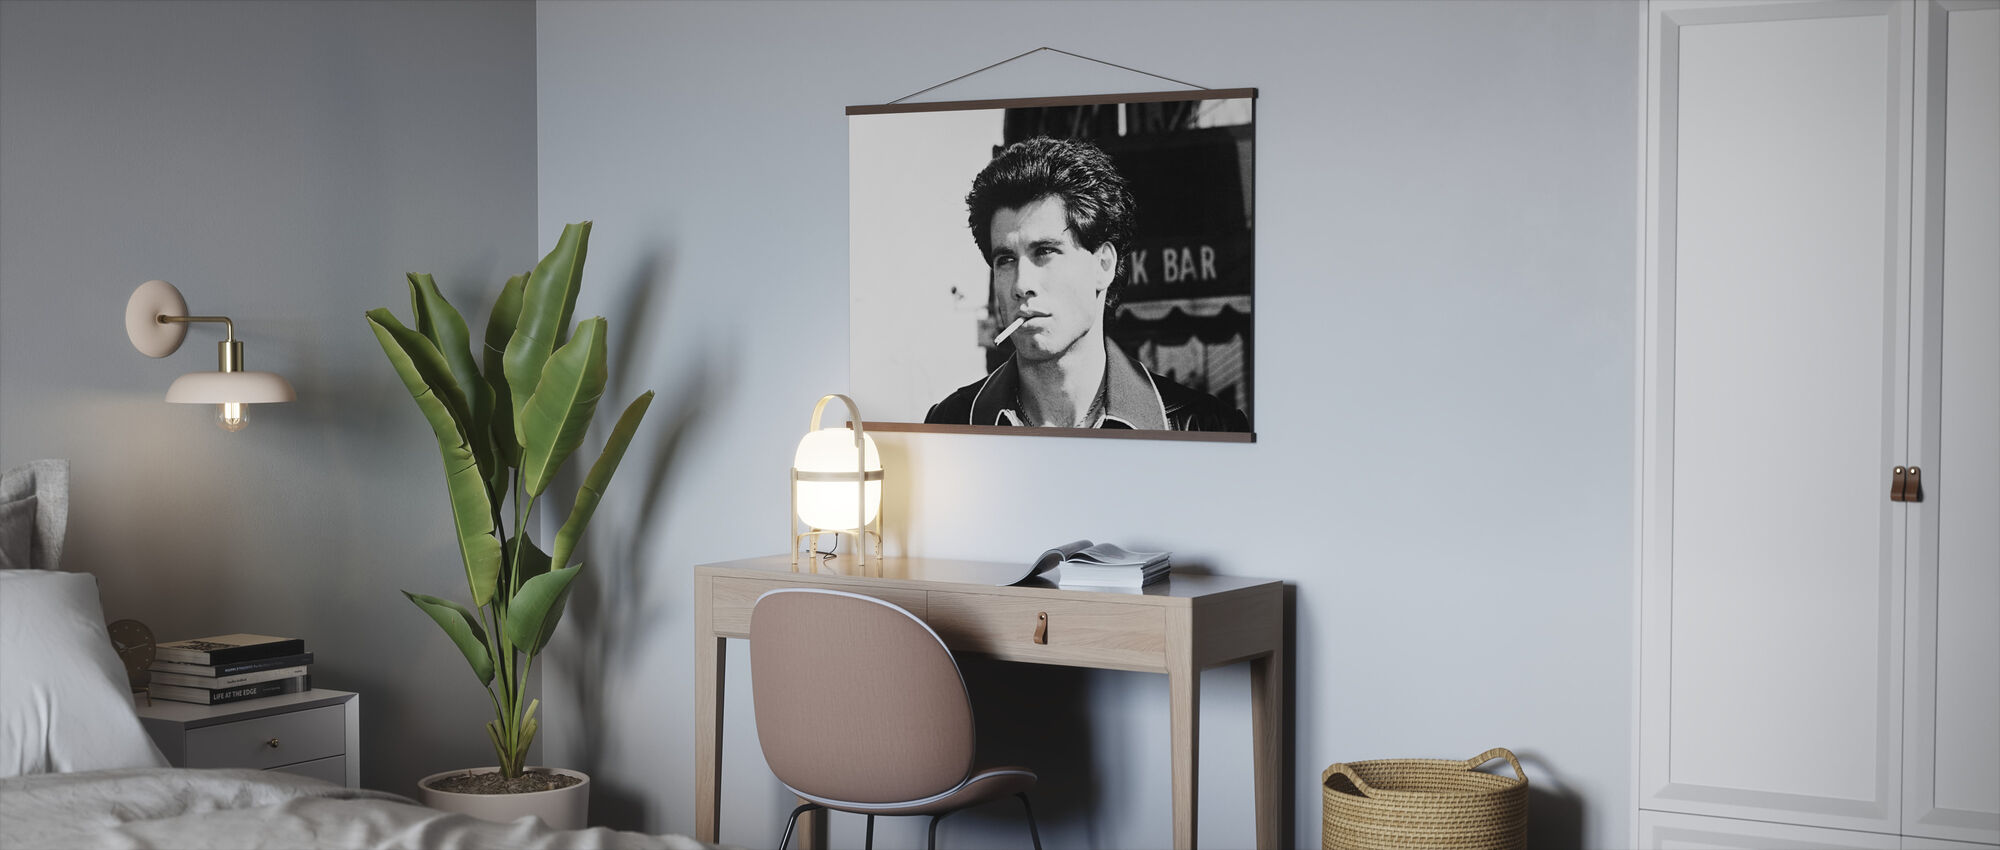 zaterdagavond Fever - John Travolta - Poster - Kantoor